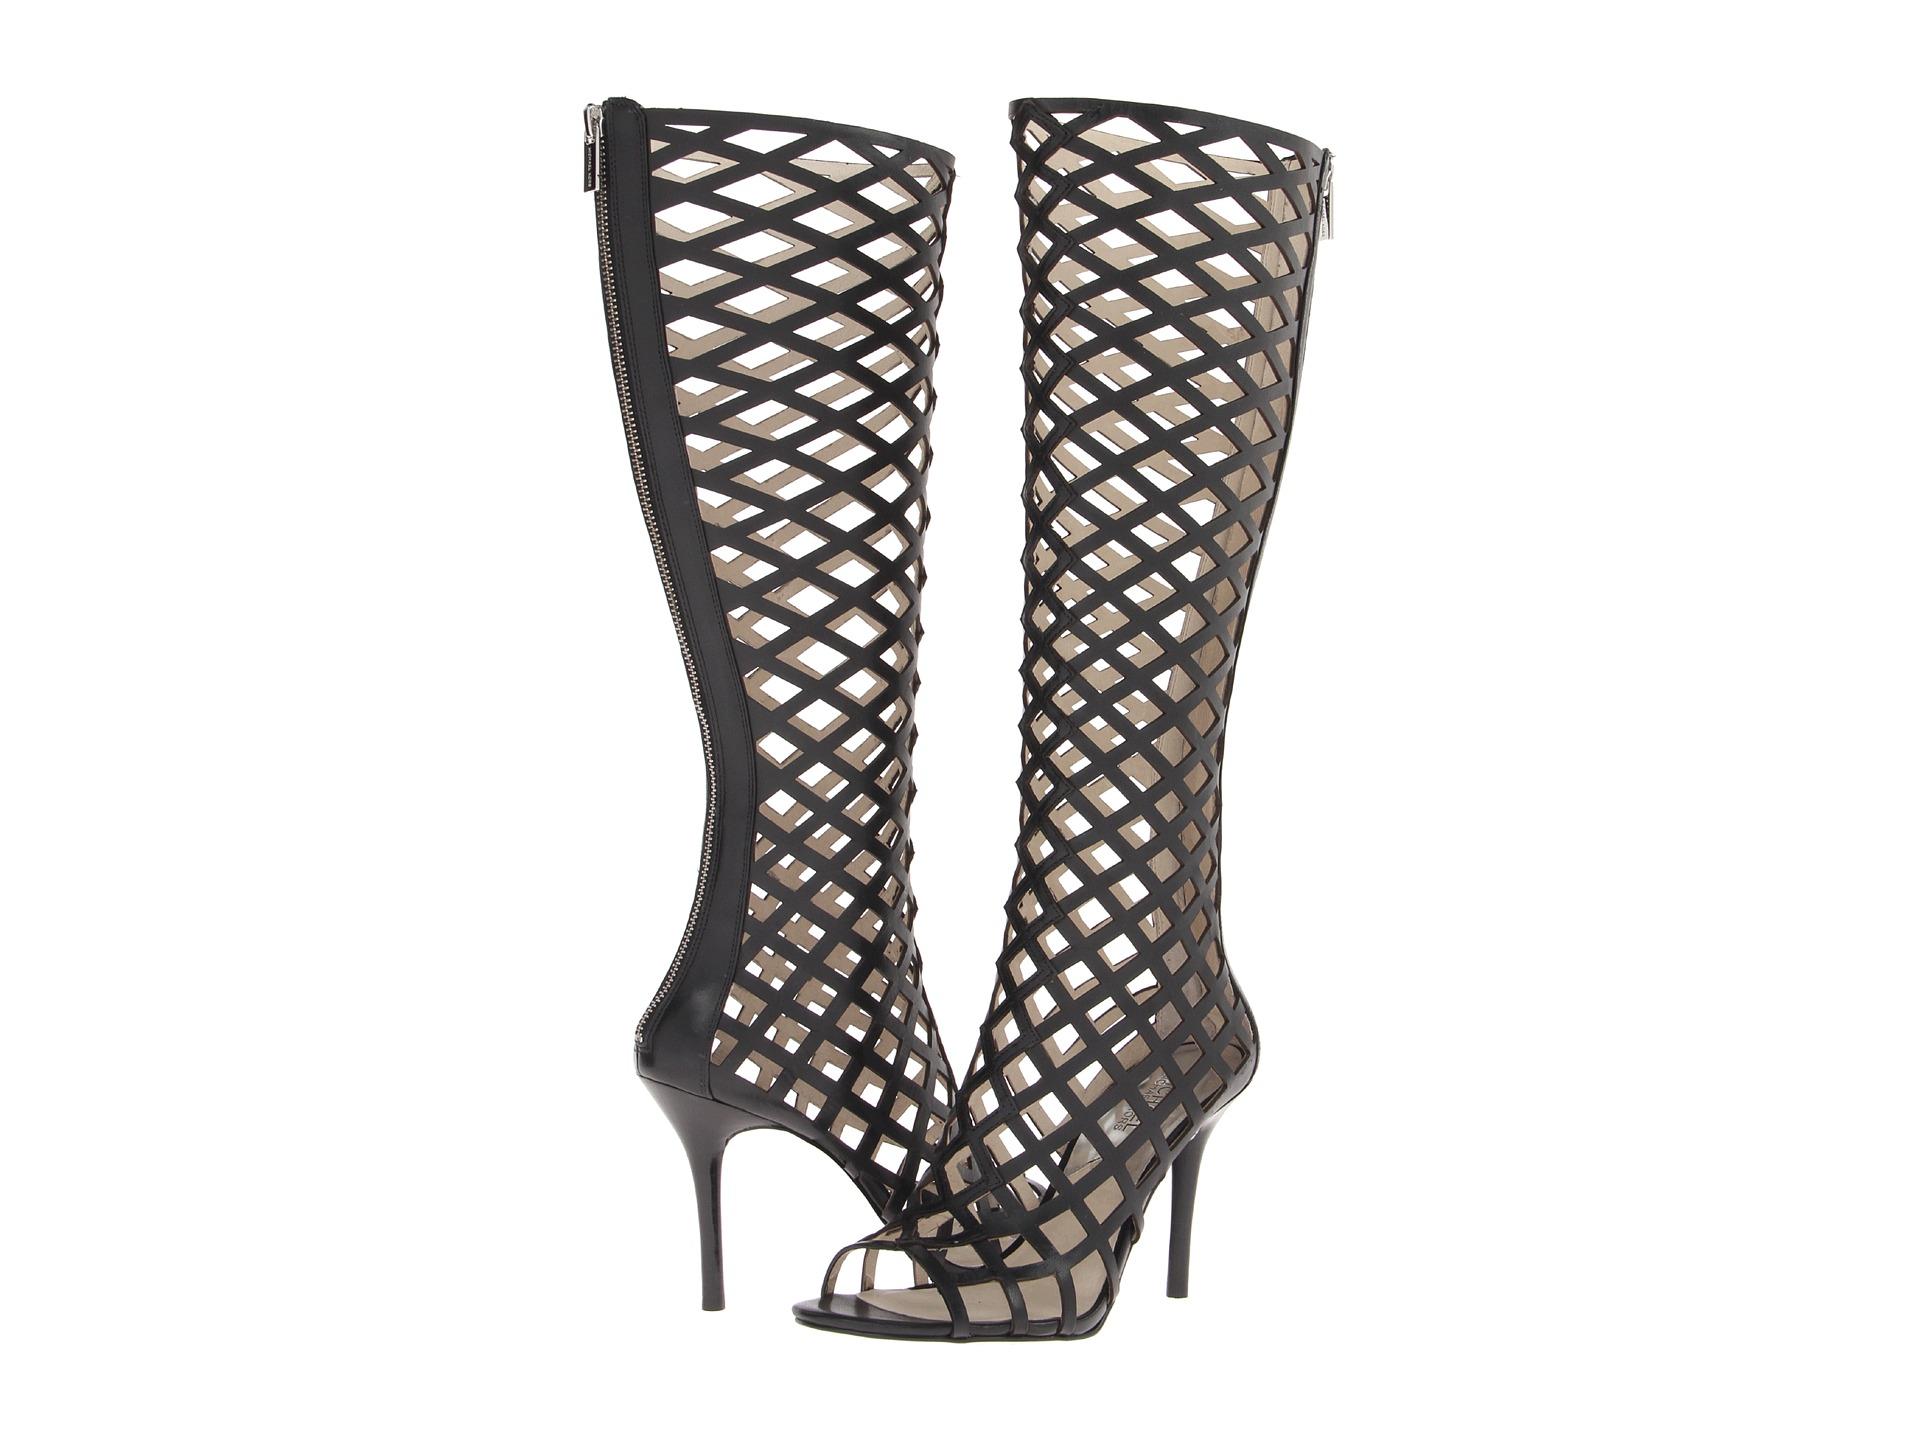 Micheal kors larissa boots for girls